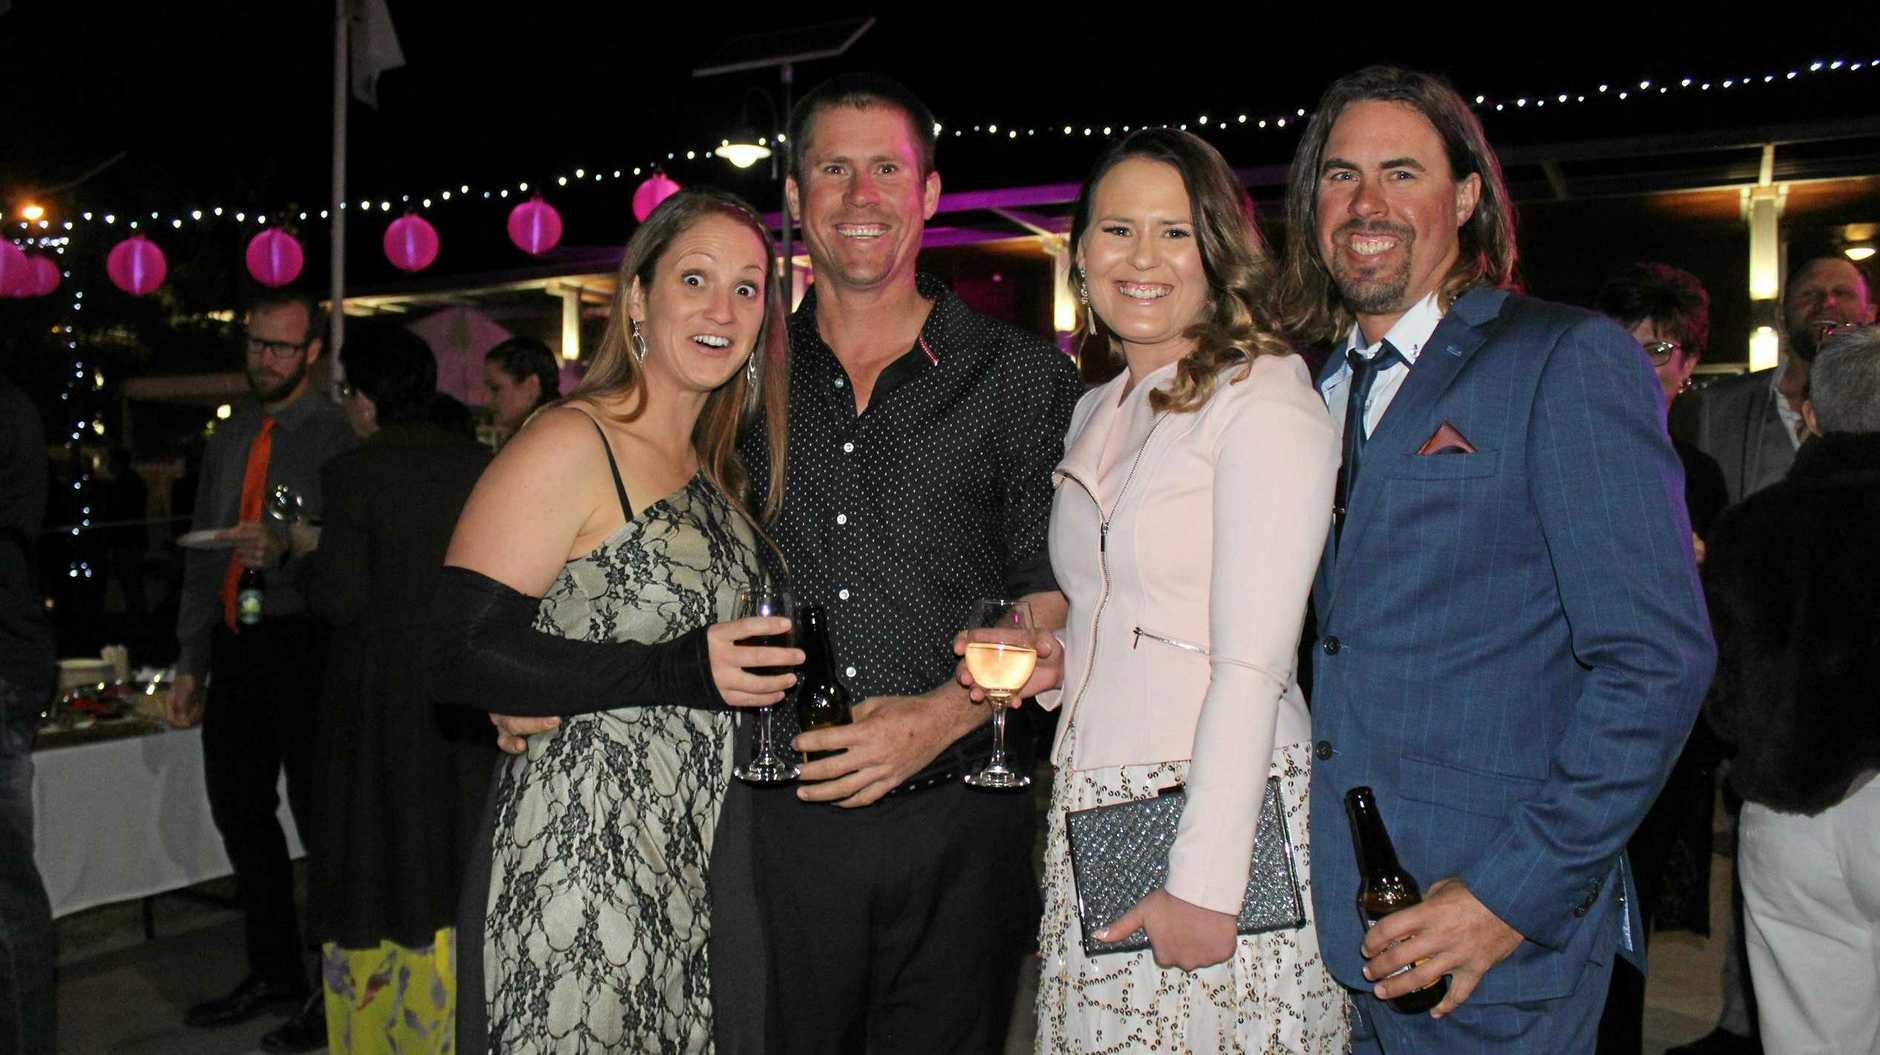 Tamara, Evan Kirstie and Wayne Schumacher at Wine and Swine 2019 as part of BaconFest.